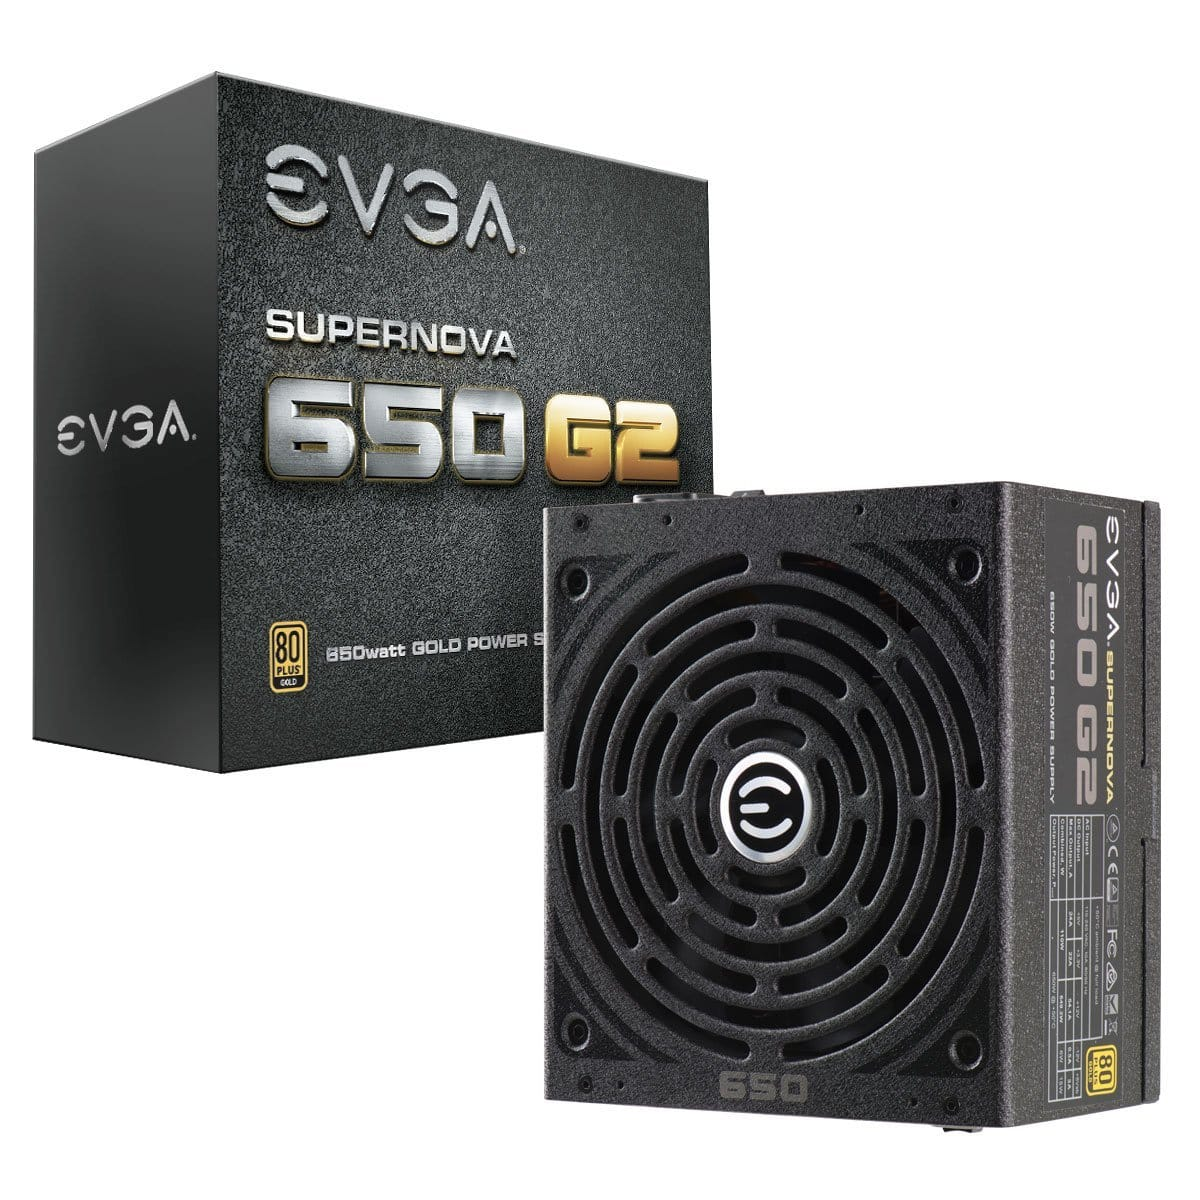 EVGA 650W SuperNOVA 80 Plus Gold ATX Power Supply  $70 after $10 Rebate + S/H